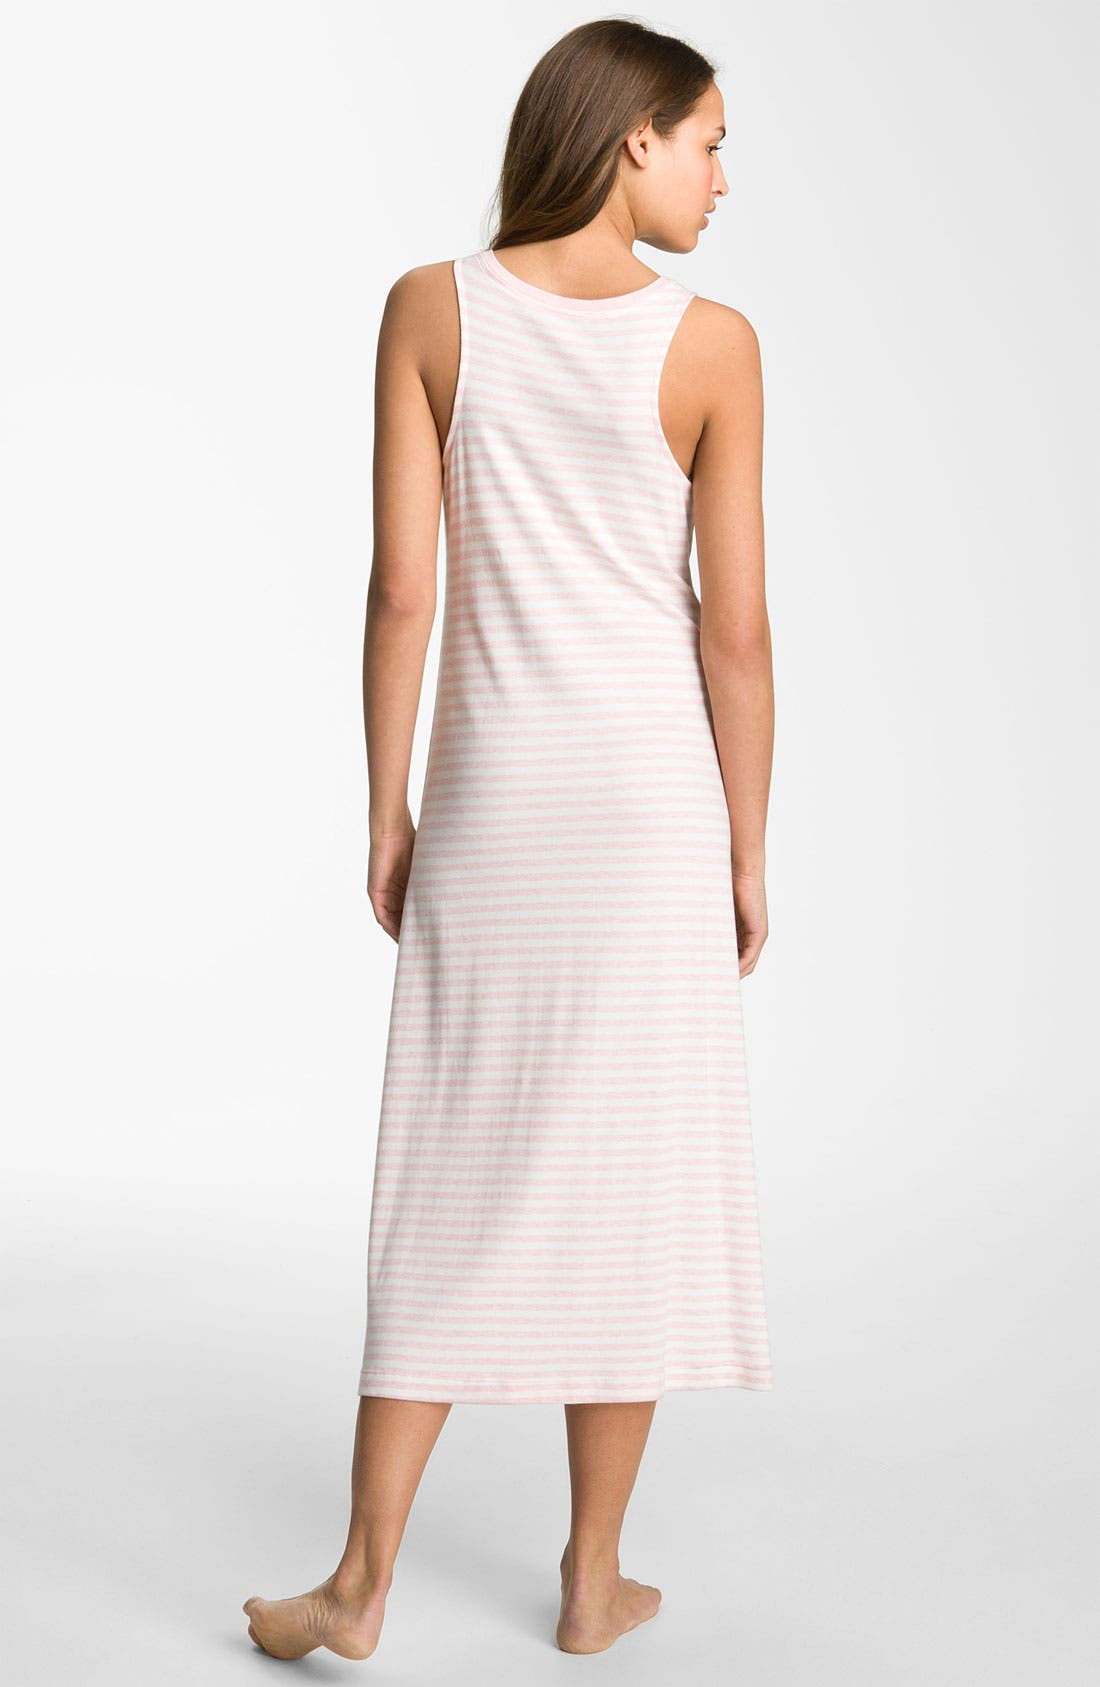 Alternate Image 2  - Carole Hochman Designs 'Gardenside' Nightgown